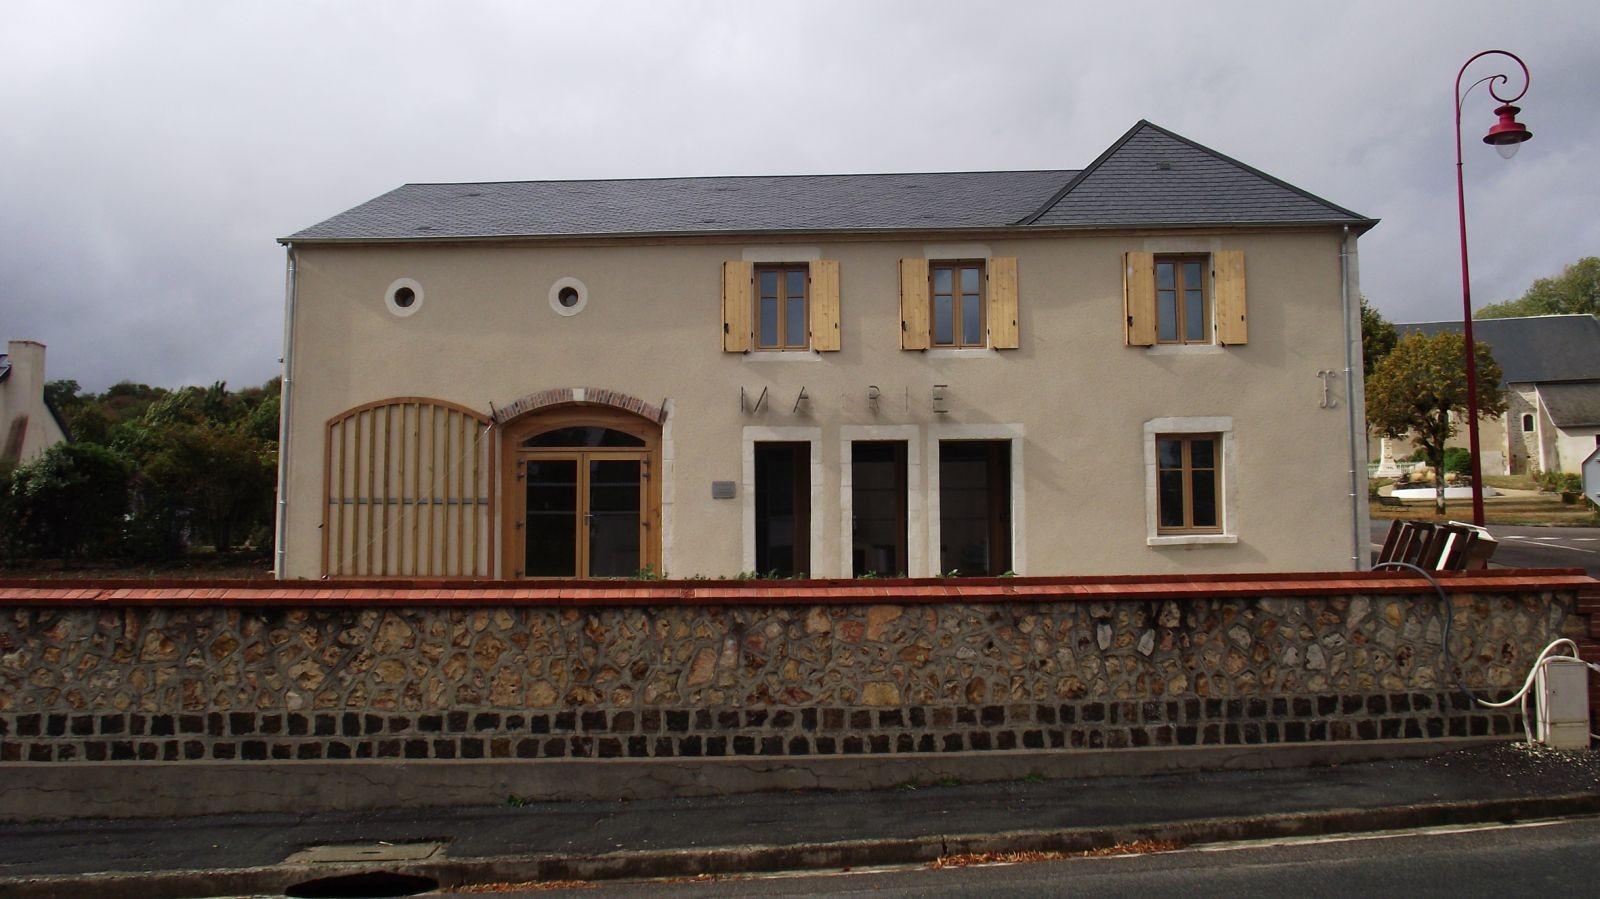 19-montigny-mairie-240919-caue18-1600x